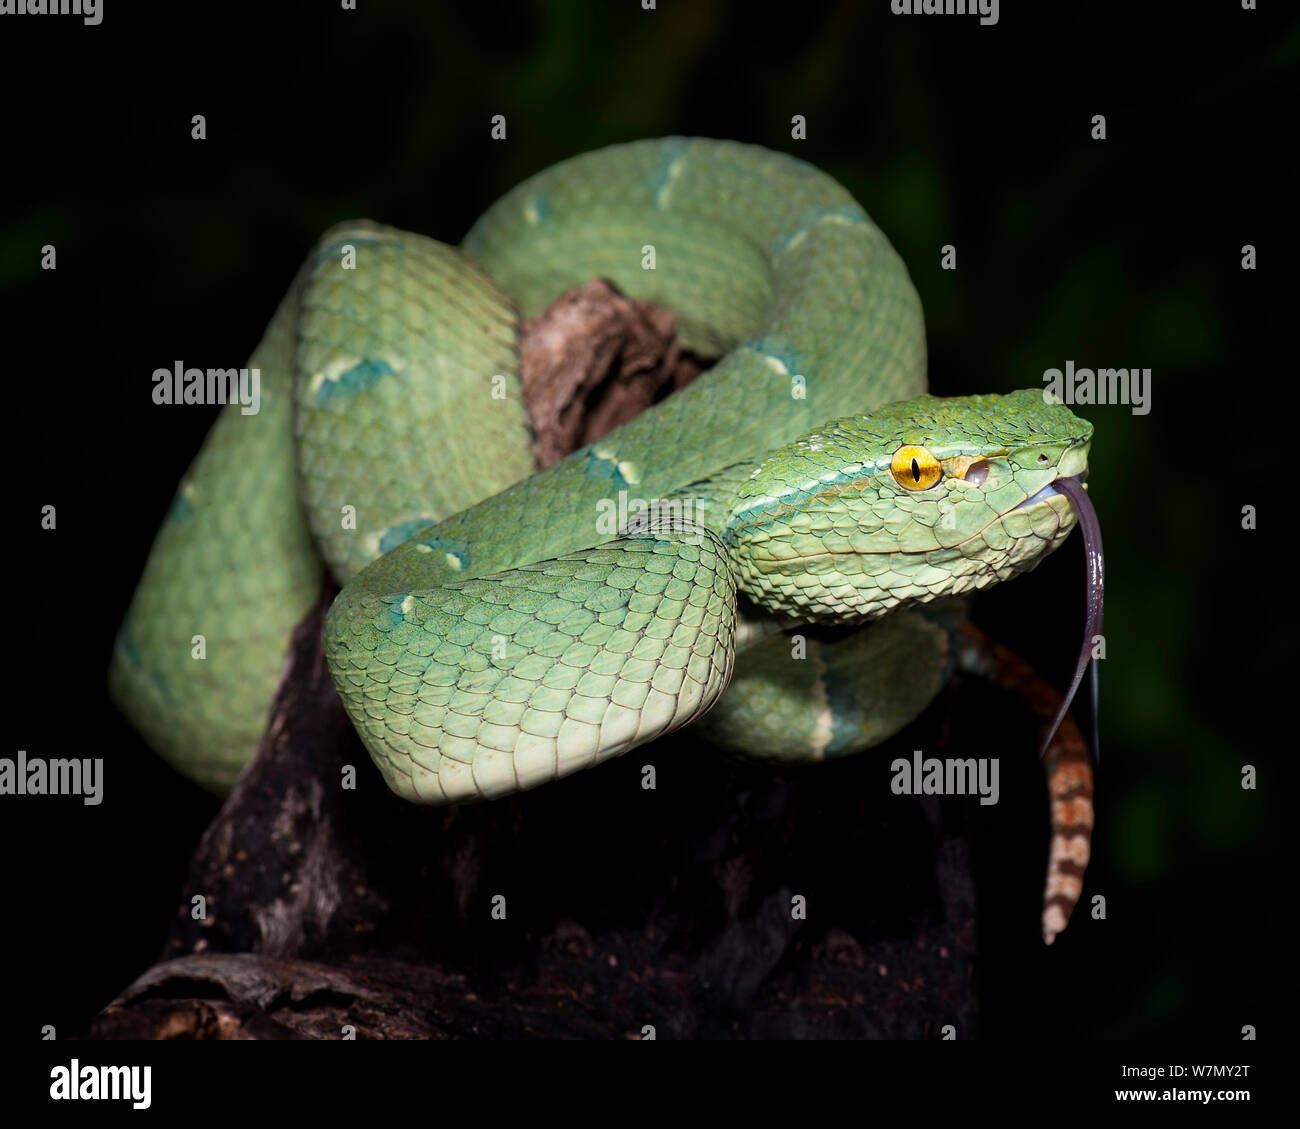 Venomous Snakes Of Malaysia Stock Photos & Venomous Snakes